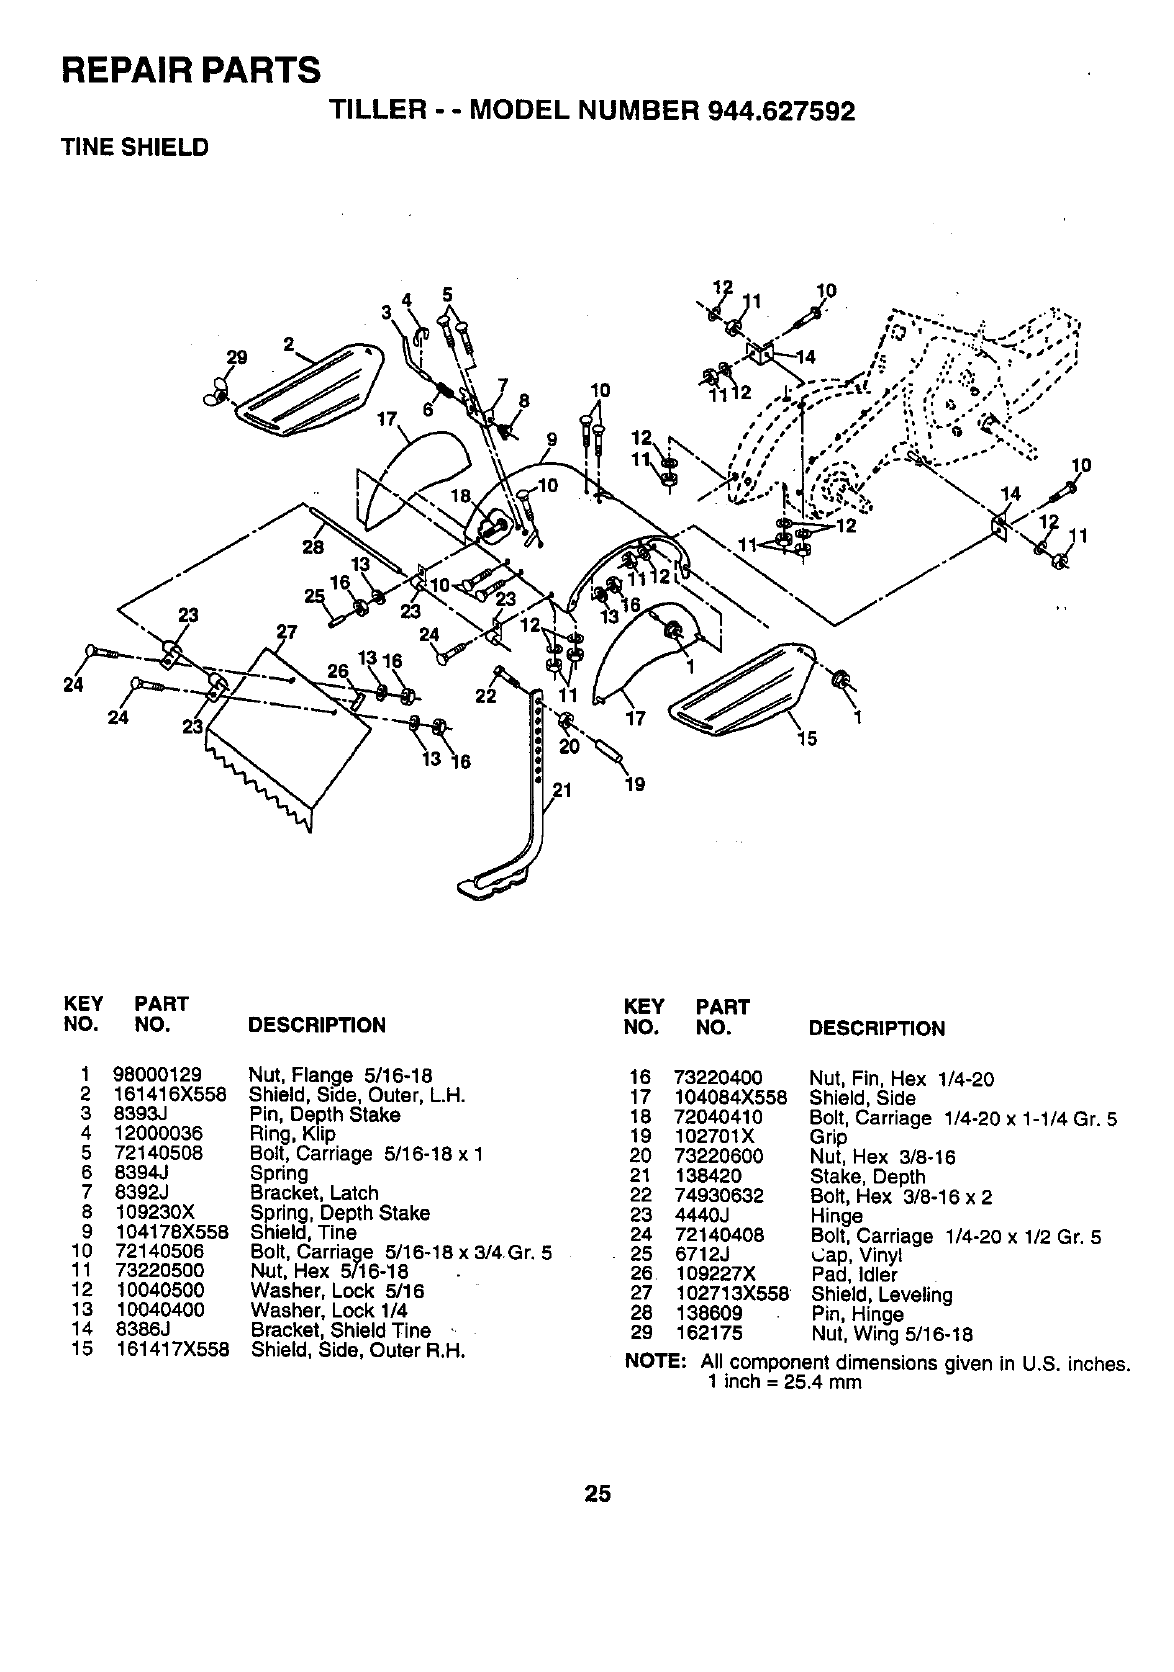 Craftsman 944627592 User Manual REAR TINE TILLER Manuals